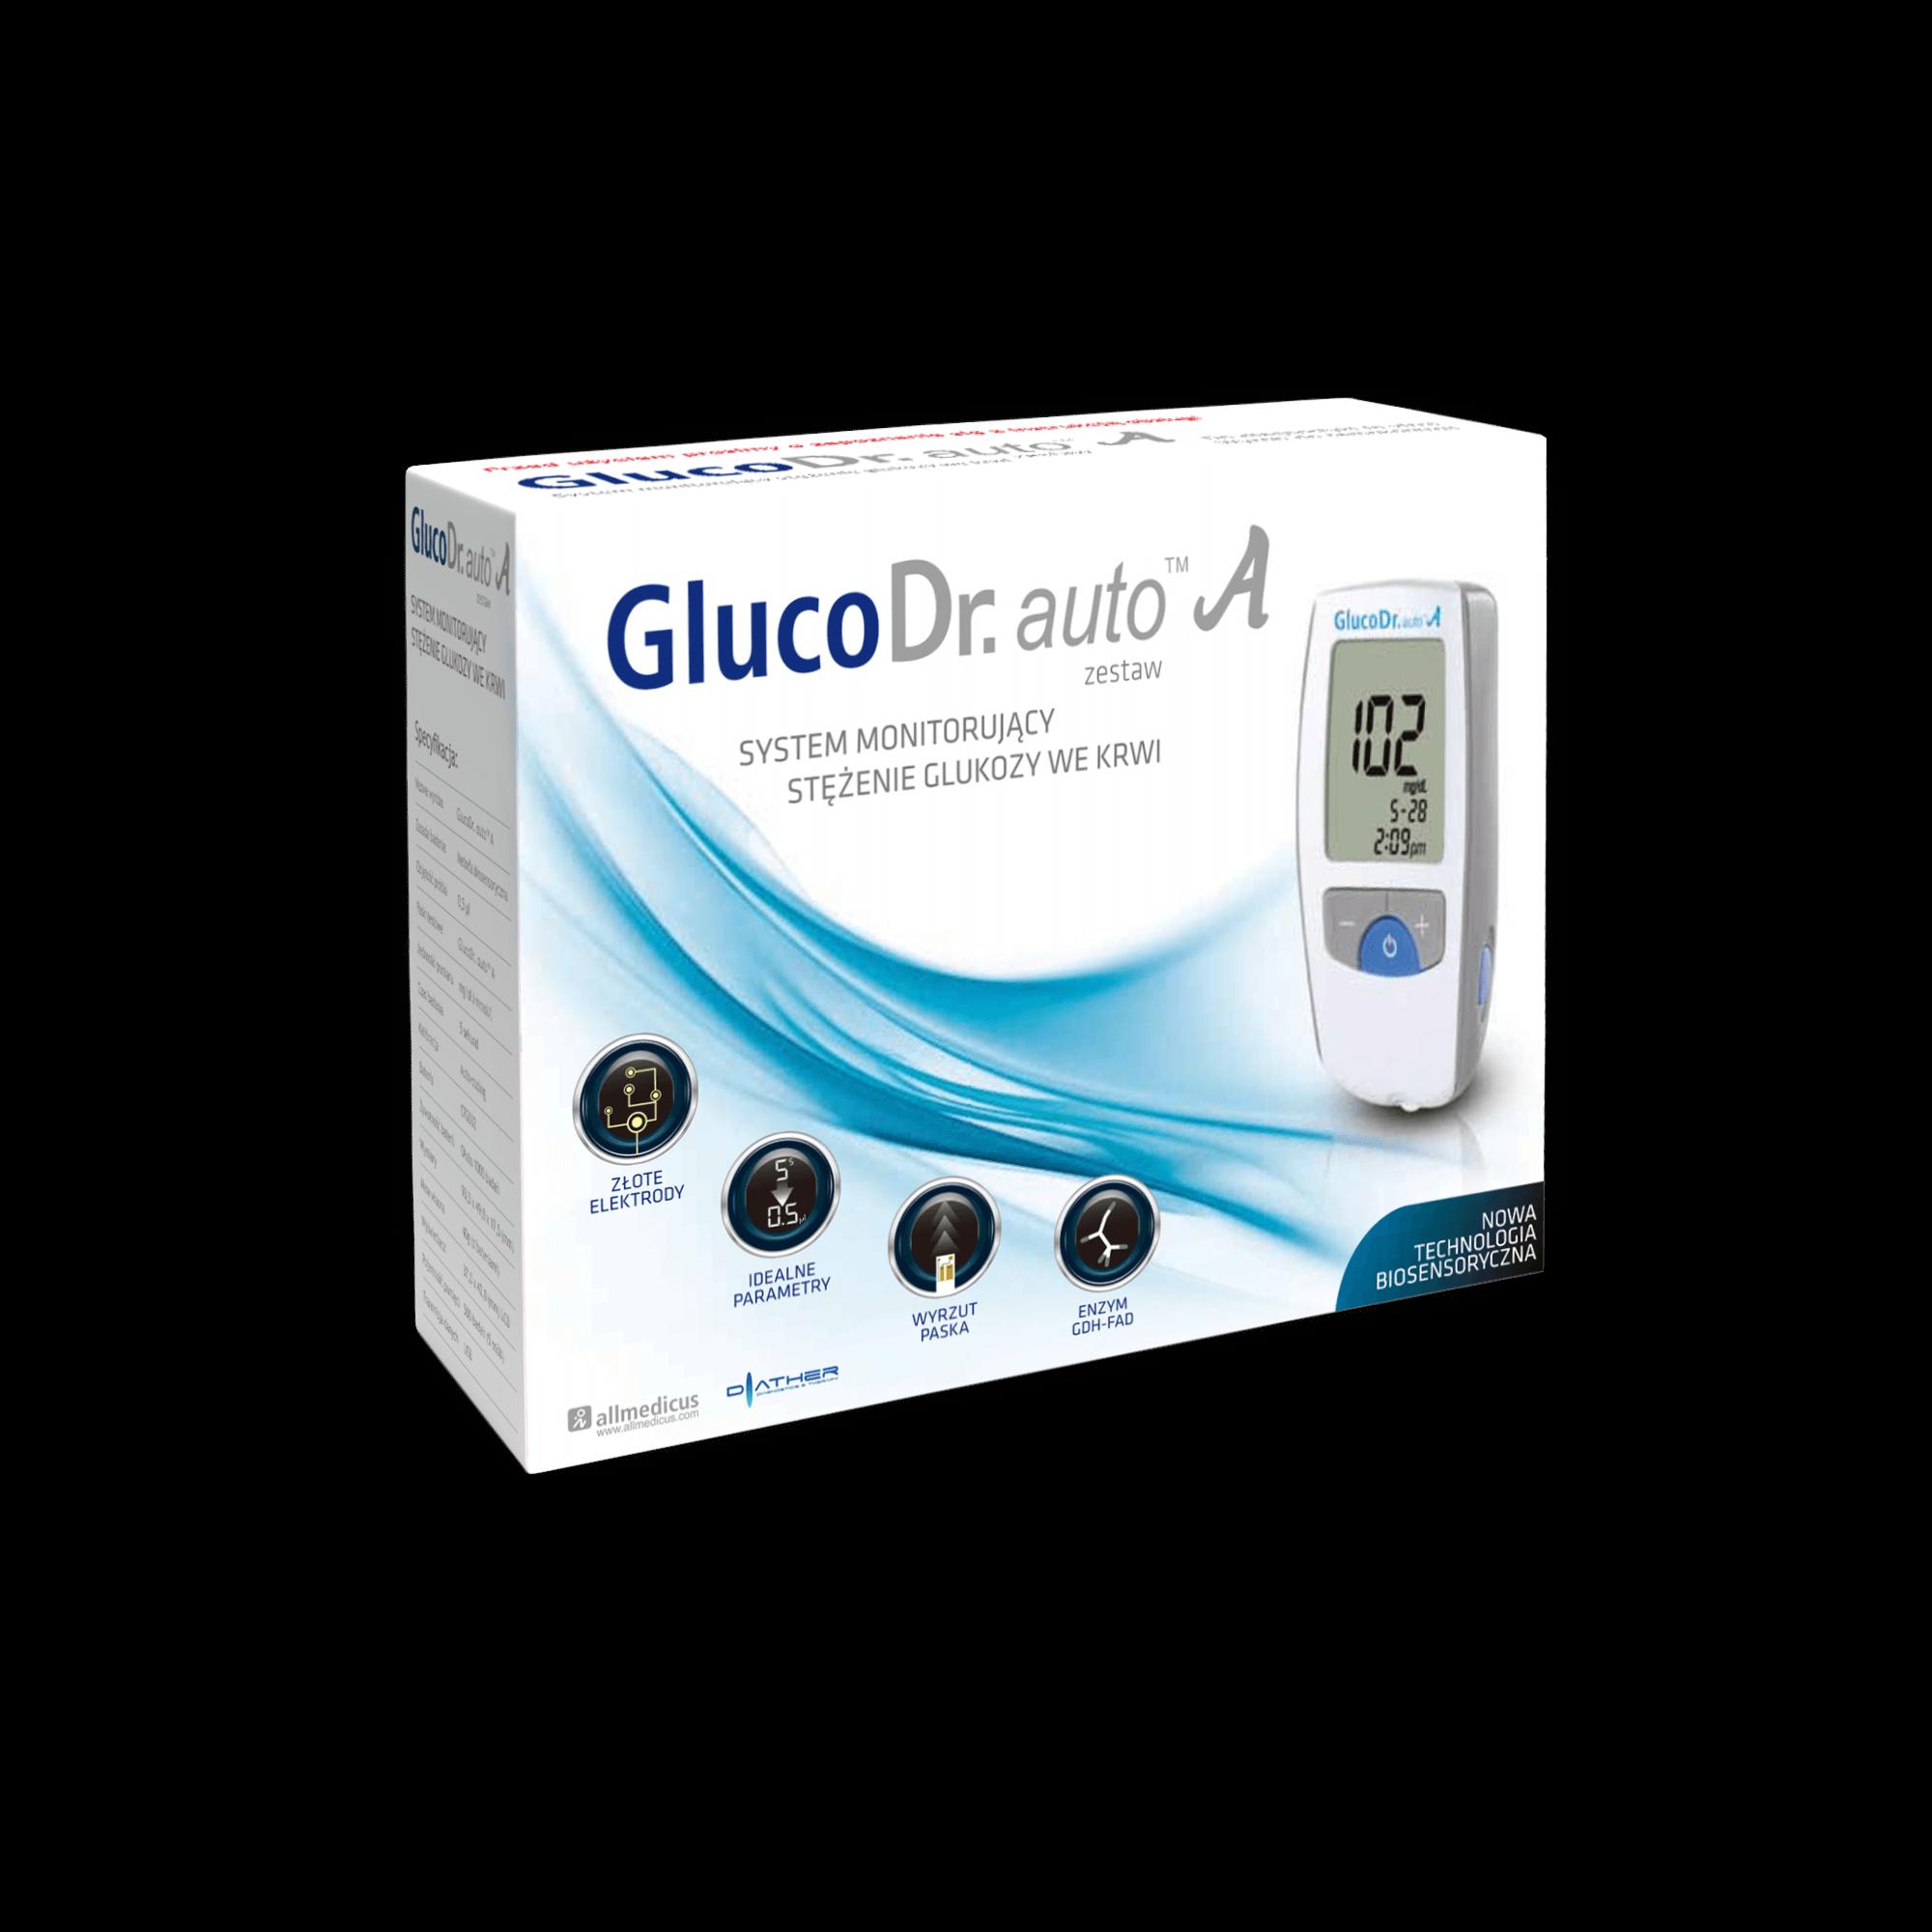 GlucoDr. auto A glukometr